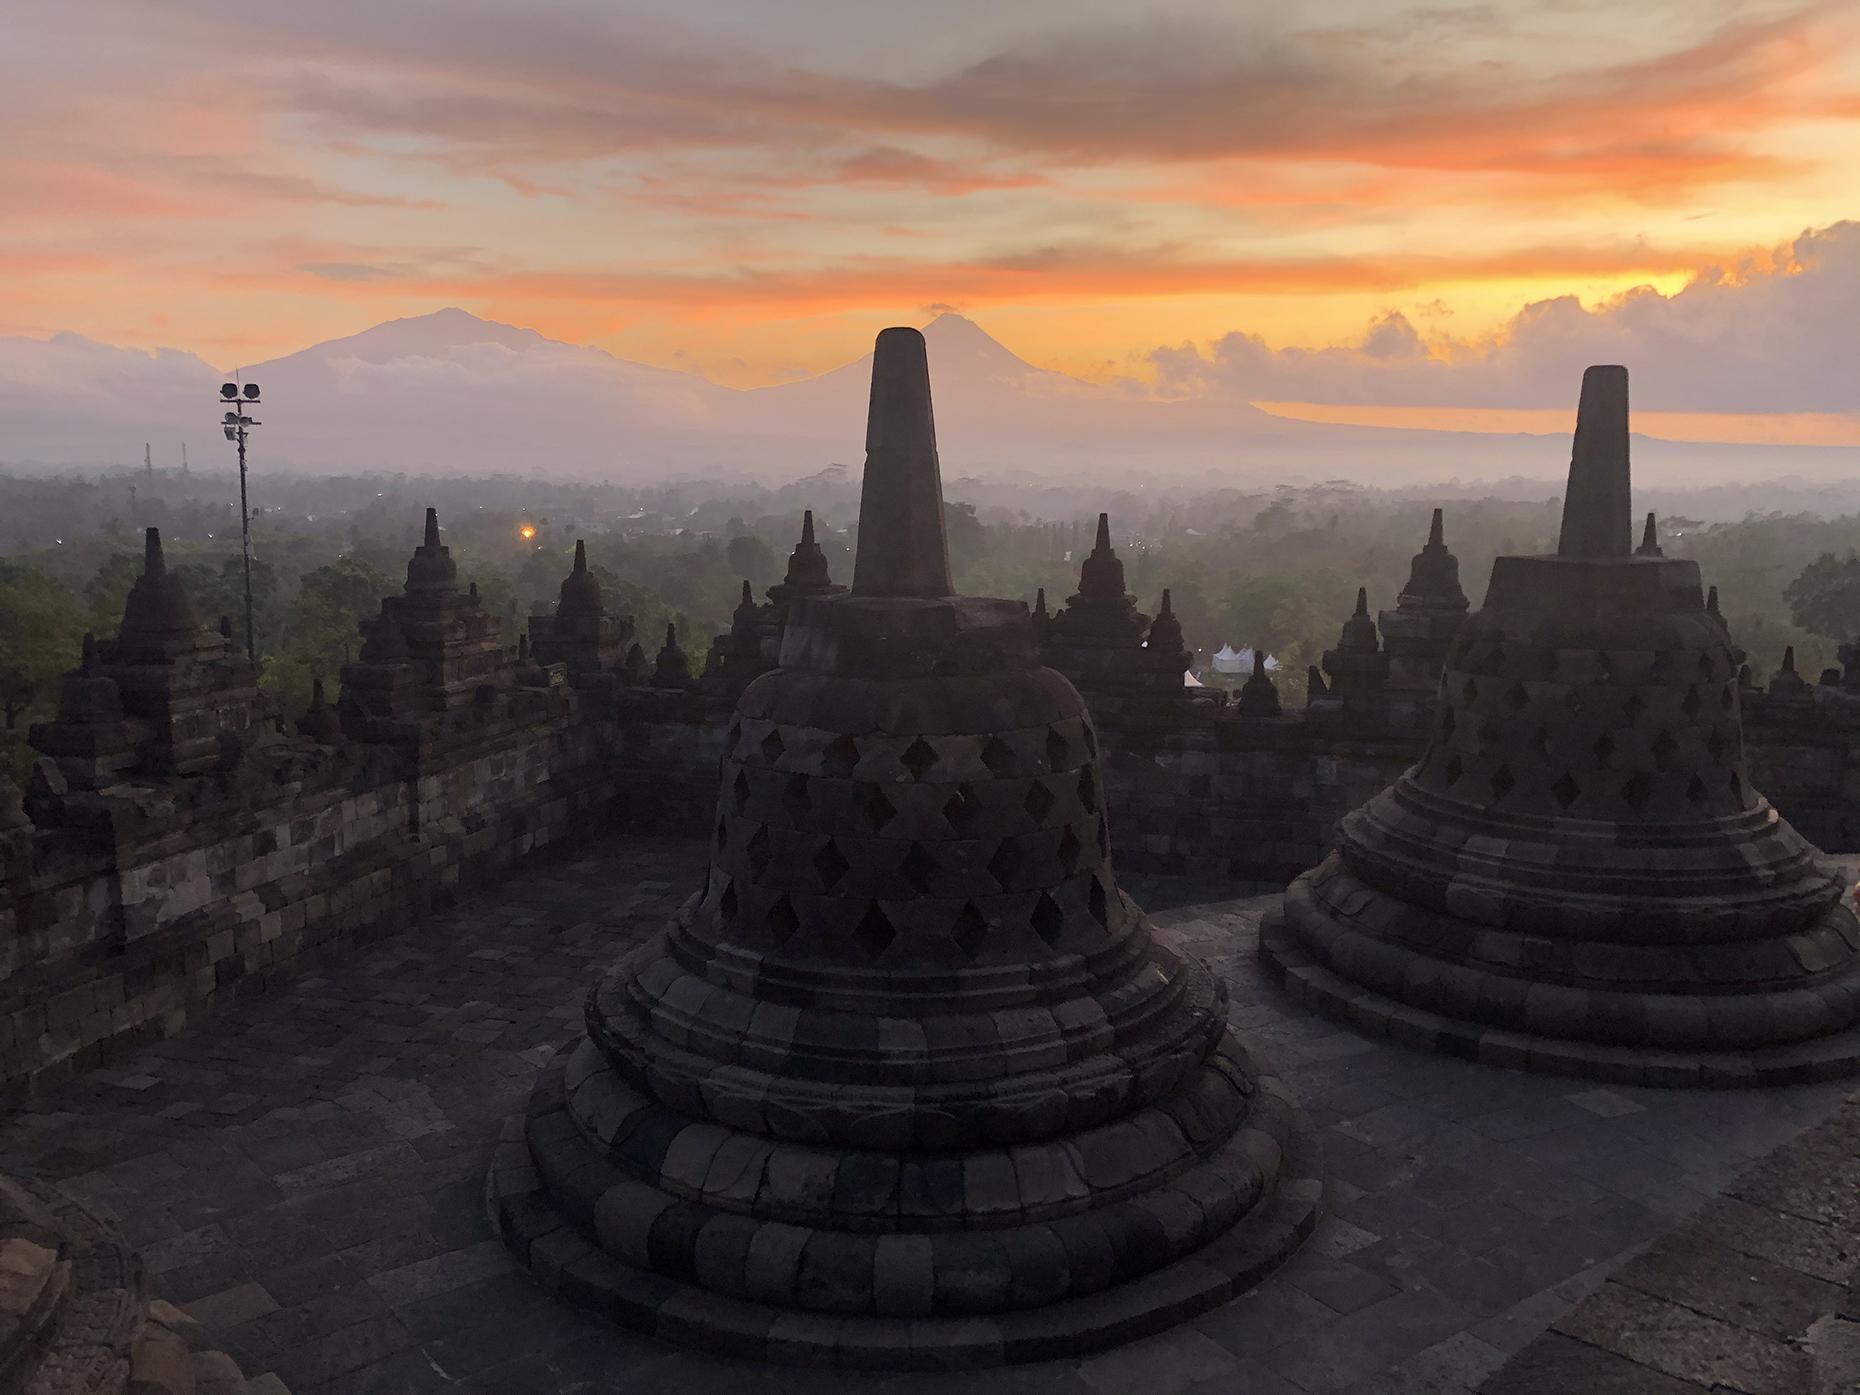 Borobodur at sunrise (Image: Daisy Meager)